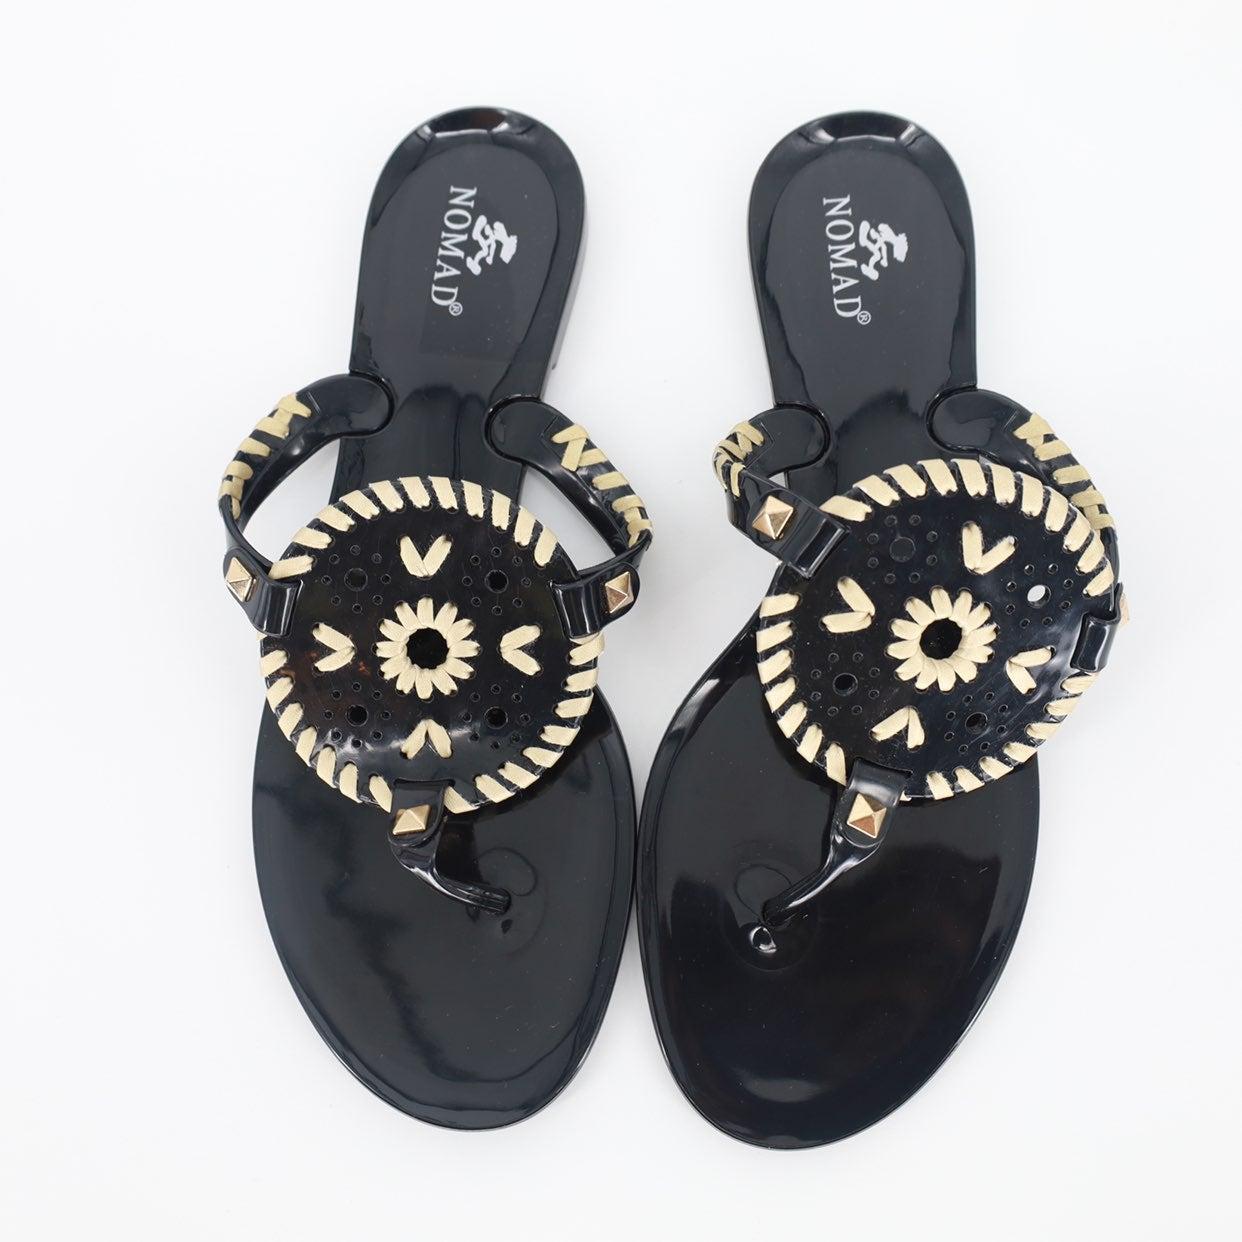 NWOB Nomad Jujube Thong Sandal